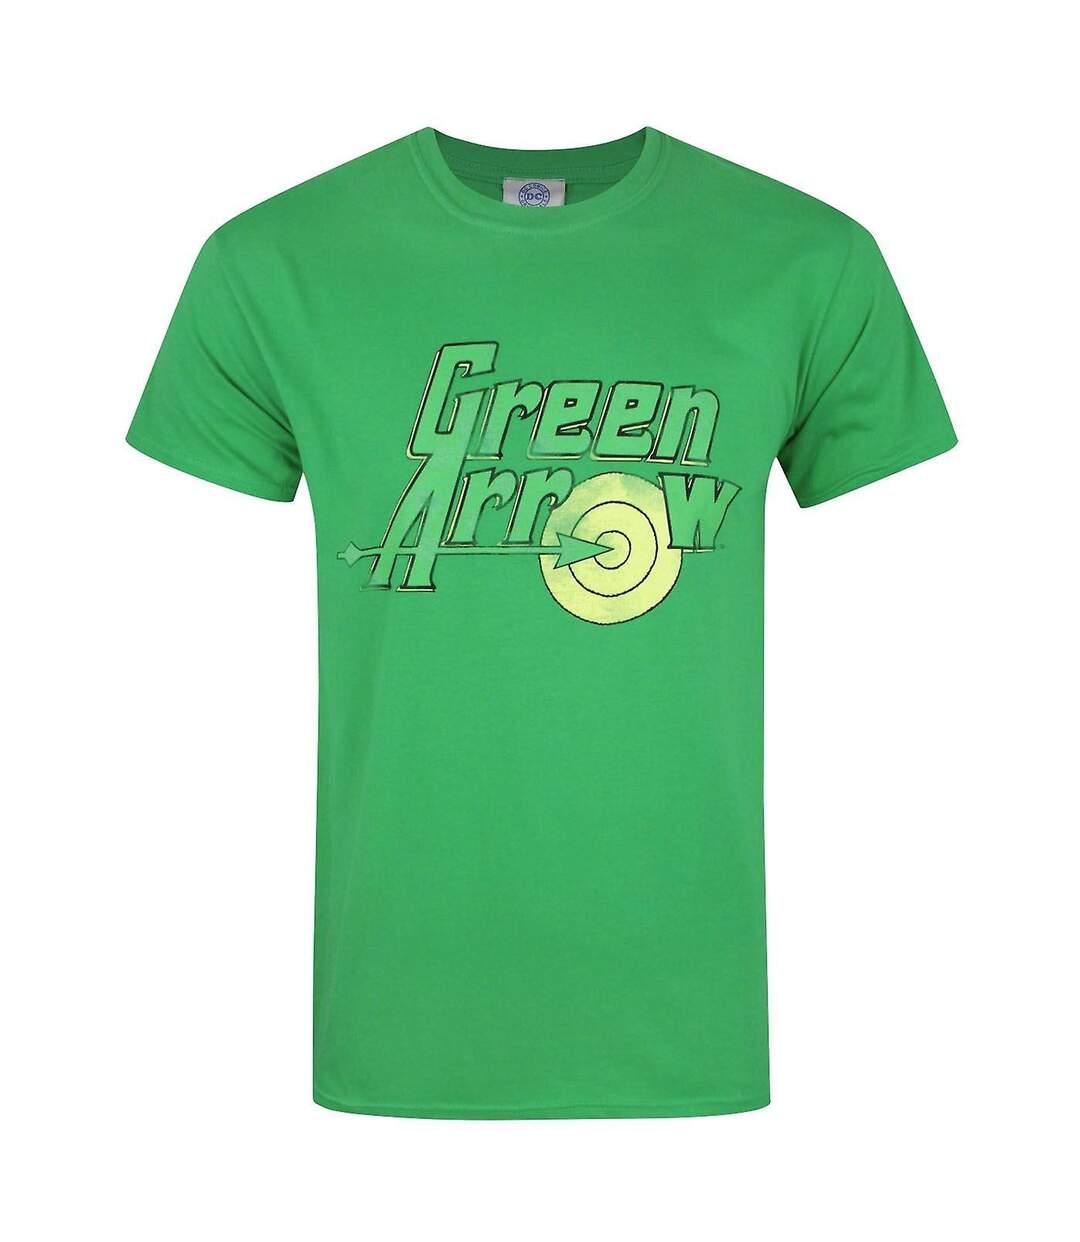 Green Arrow Mens Logo T-Shirt (Green) - UTNS5295